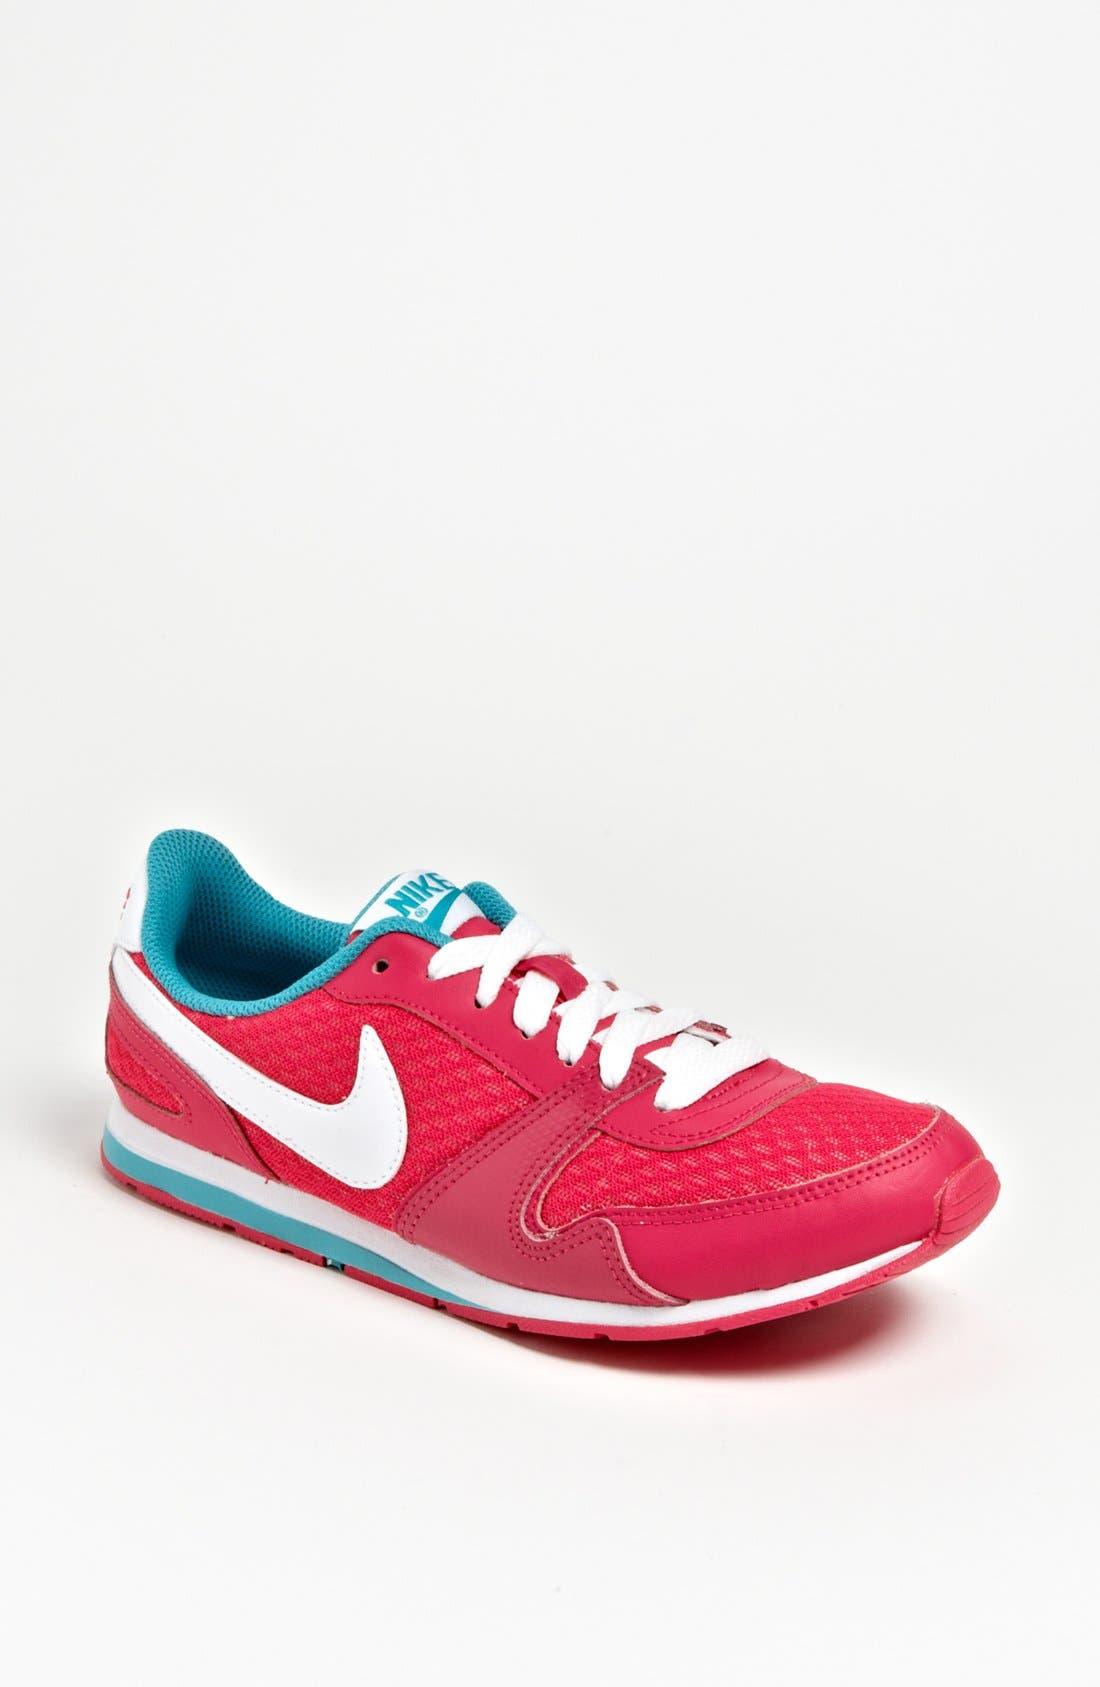 Main Image - Nike 'Eclipse II' Sneaker (Women)